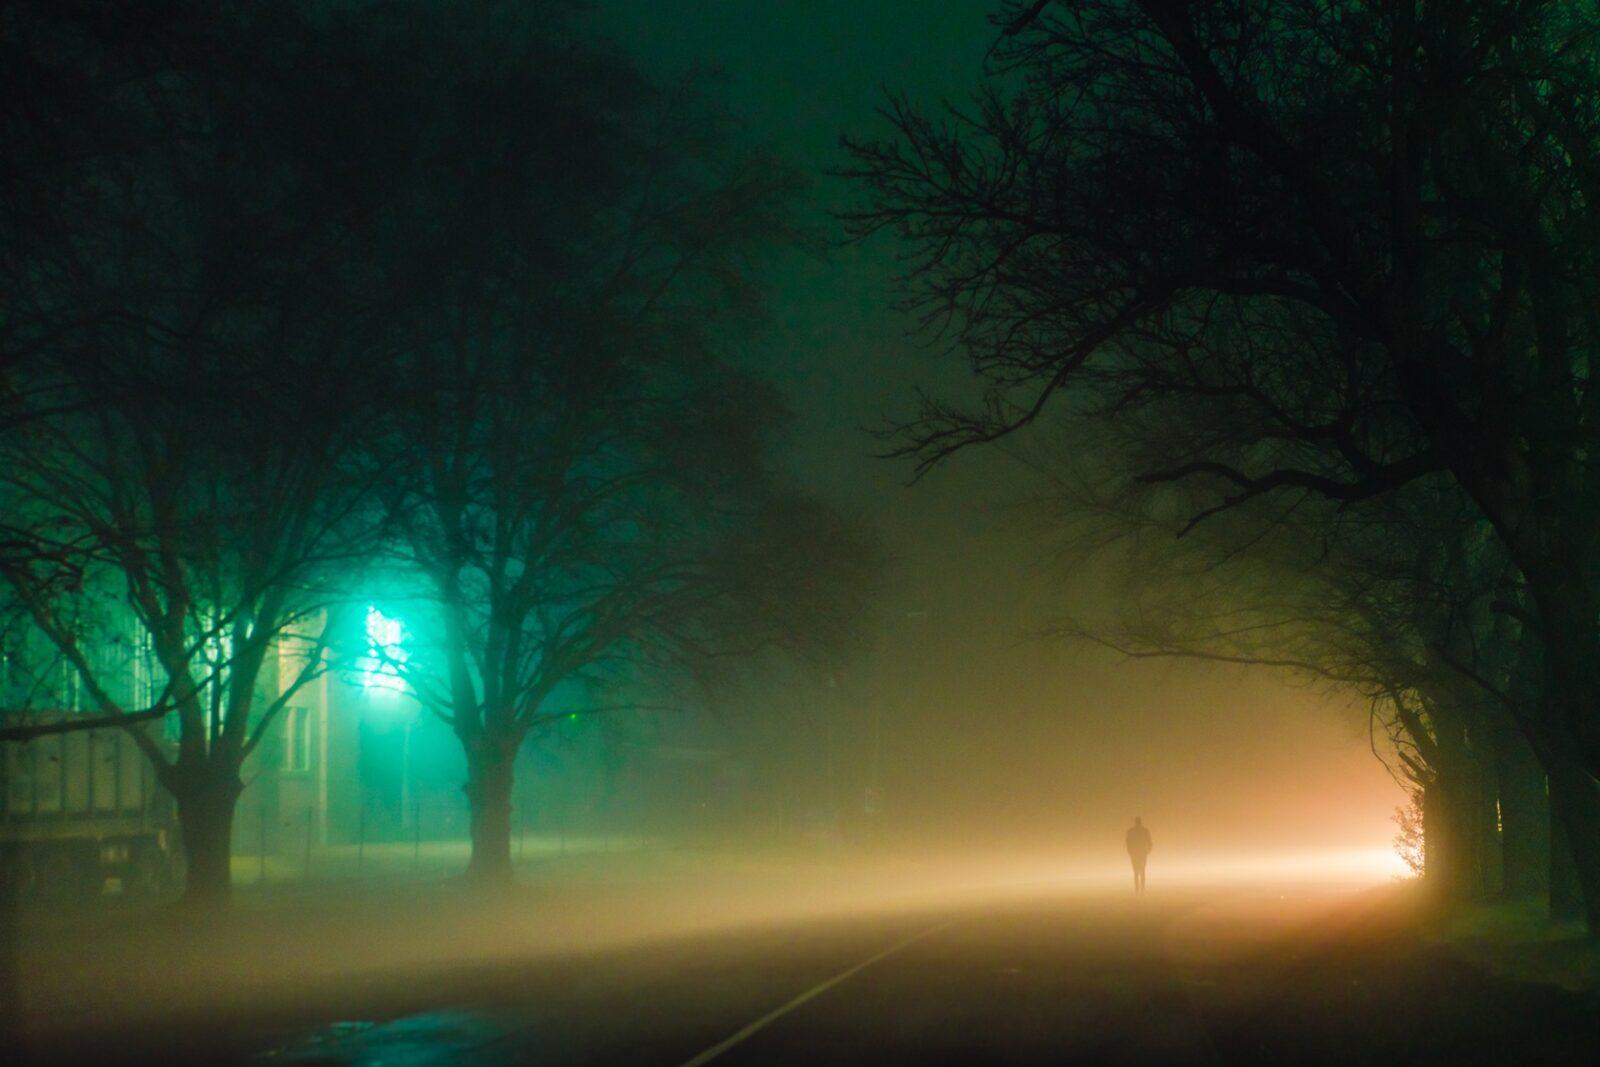 Photographer Elsa Bleda And Nighttime City Scenes